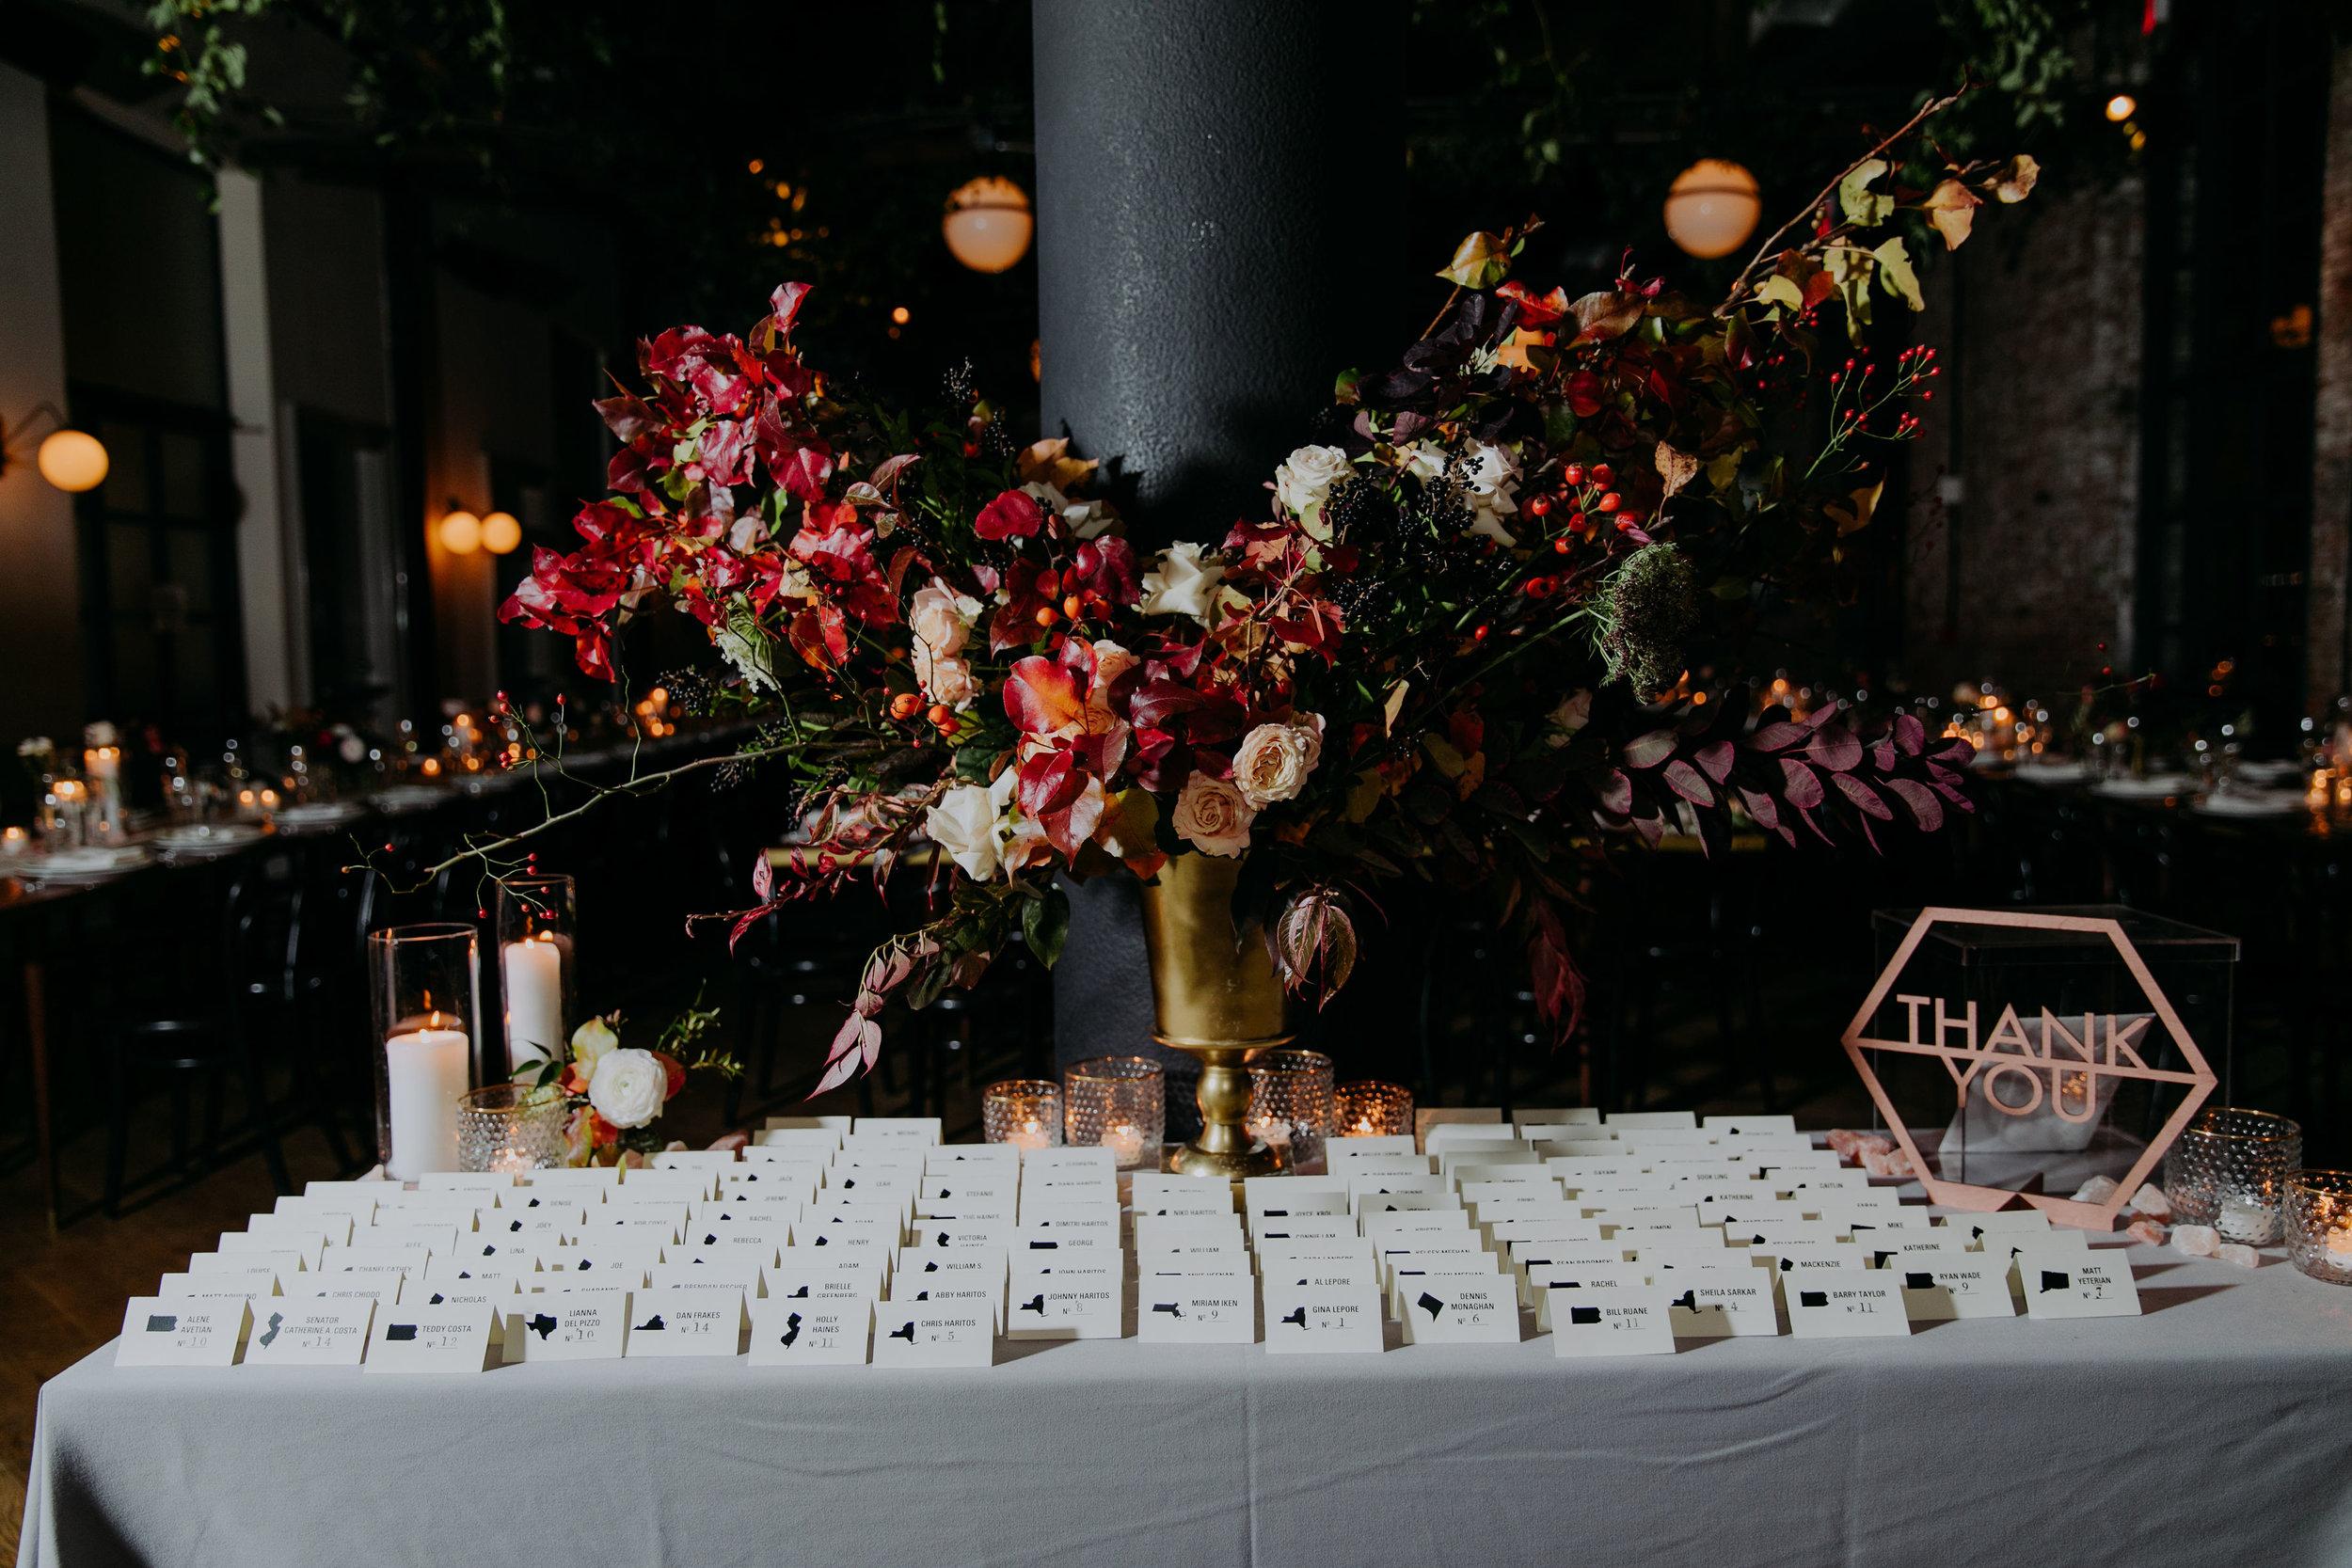 wythe-hotel-wedding-photographer-amber-gress-0481.jpg